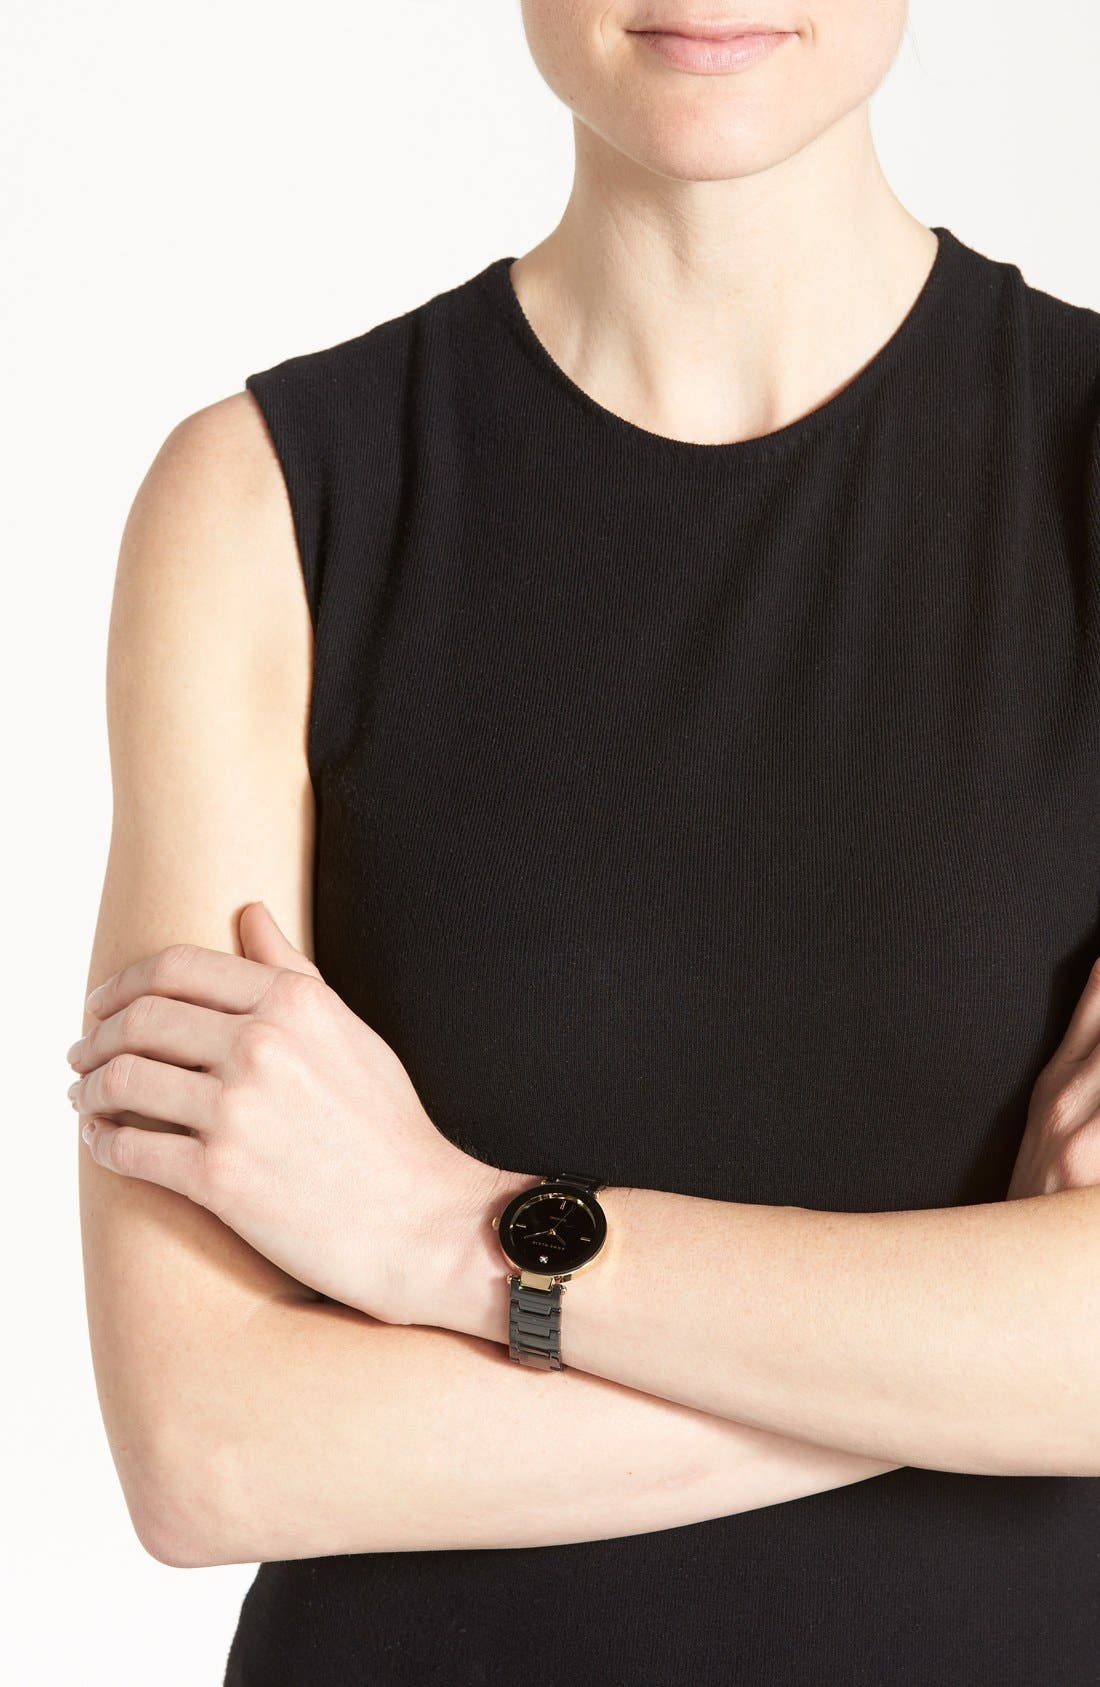 ANNE KLEIN,                             Round Ceramic Bracelet Watch, 33mm,                             Alternate thumbnail 2, color,                             001